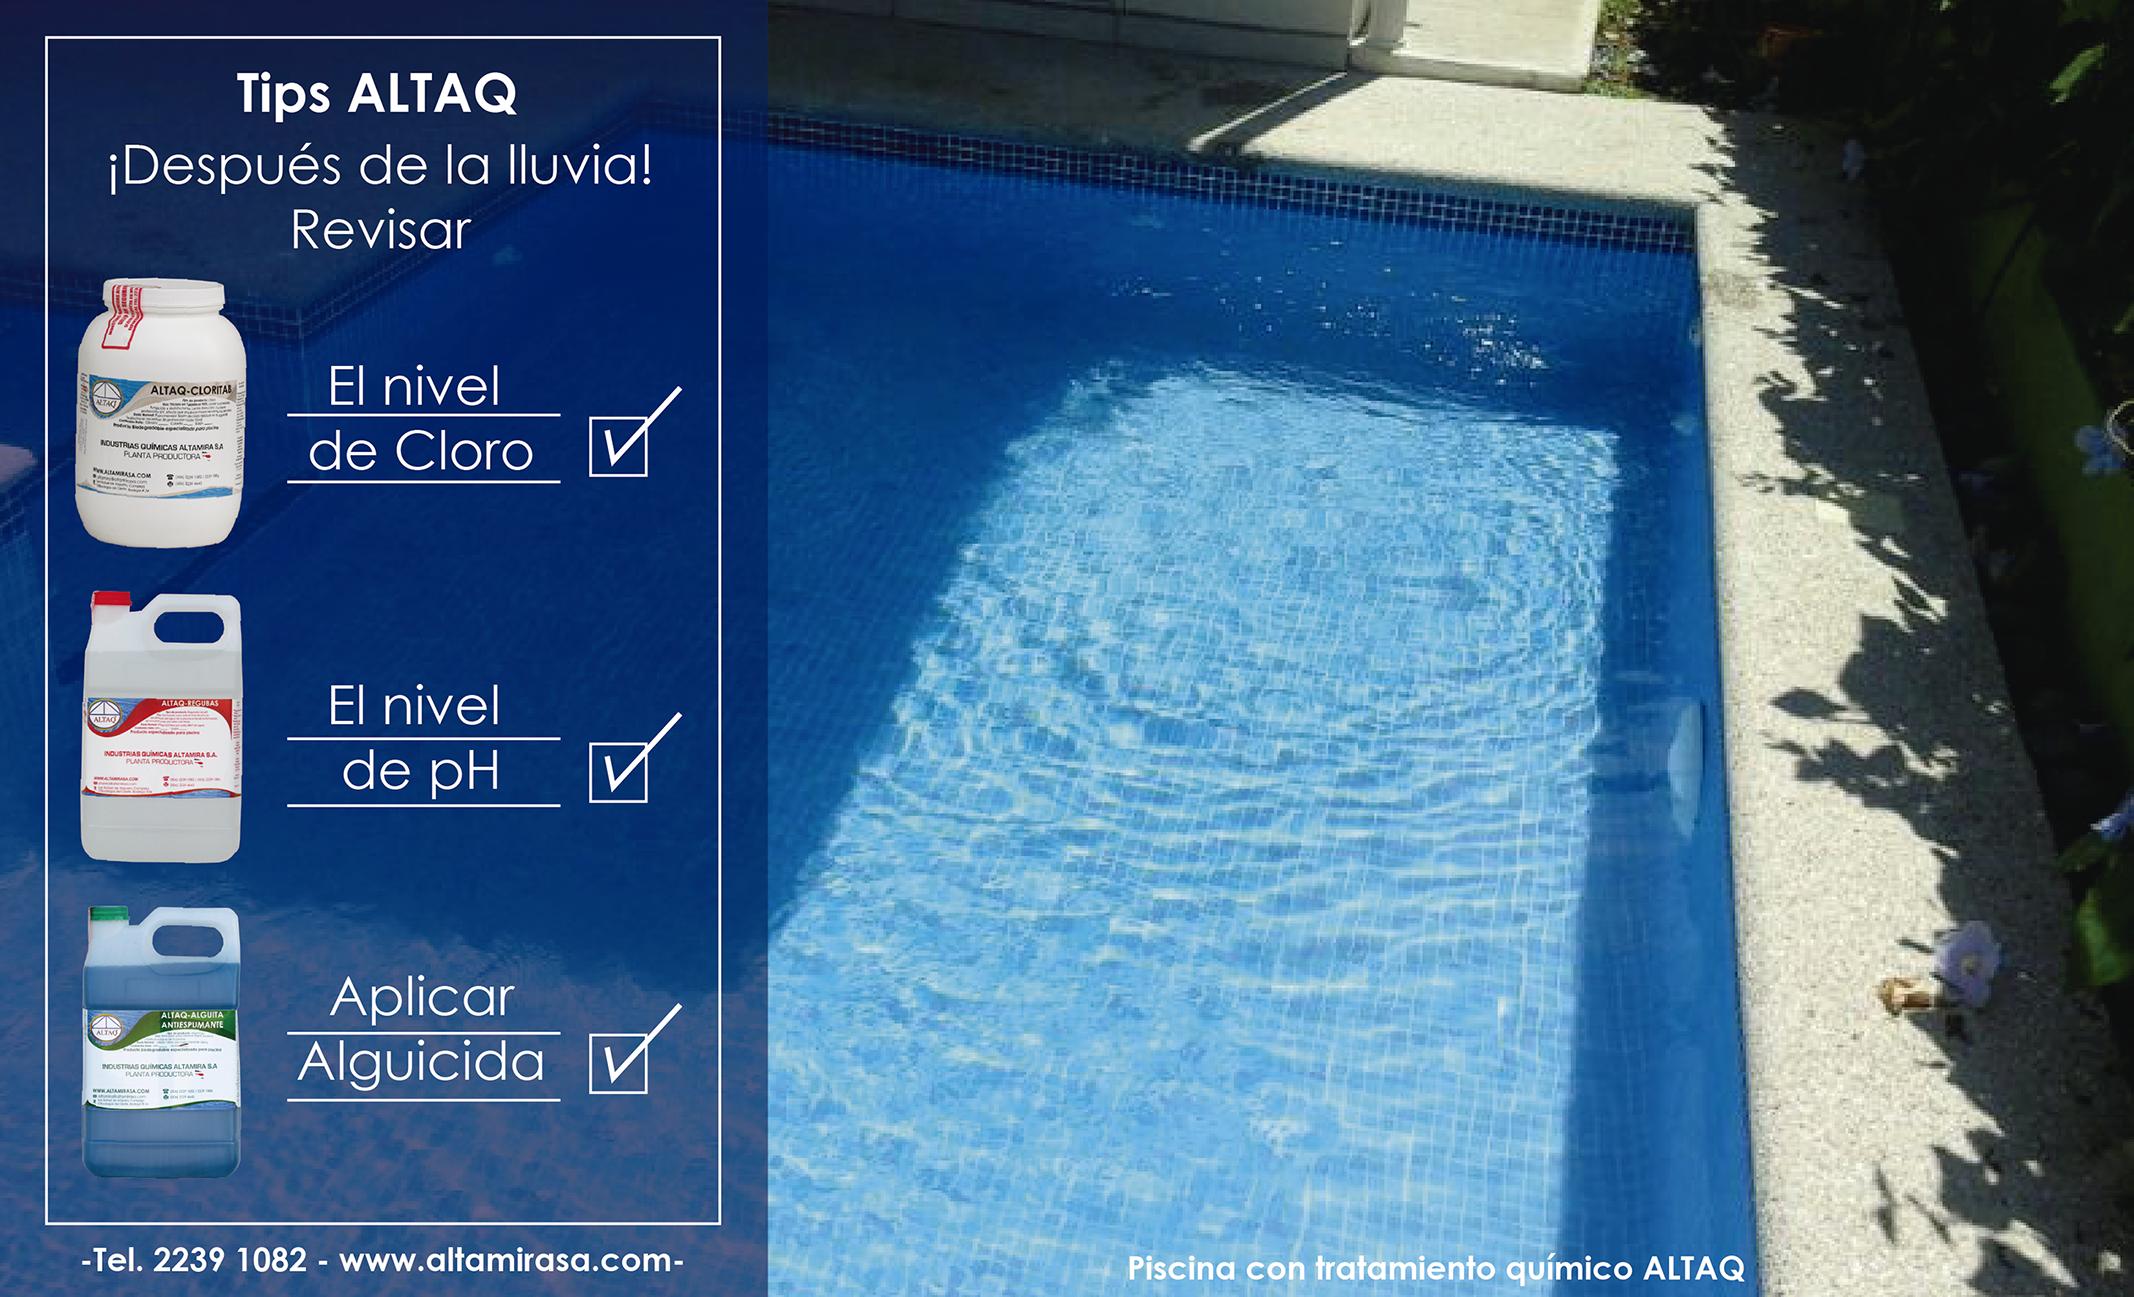 Tips ALTAQ ¡Mantenimiento de piscinas en época de lluvia!